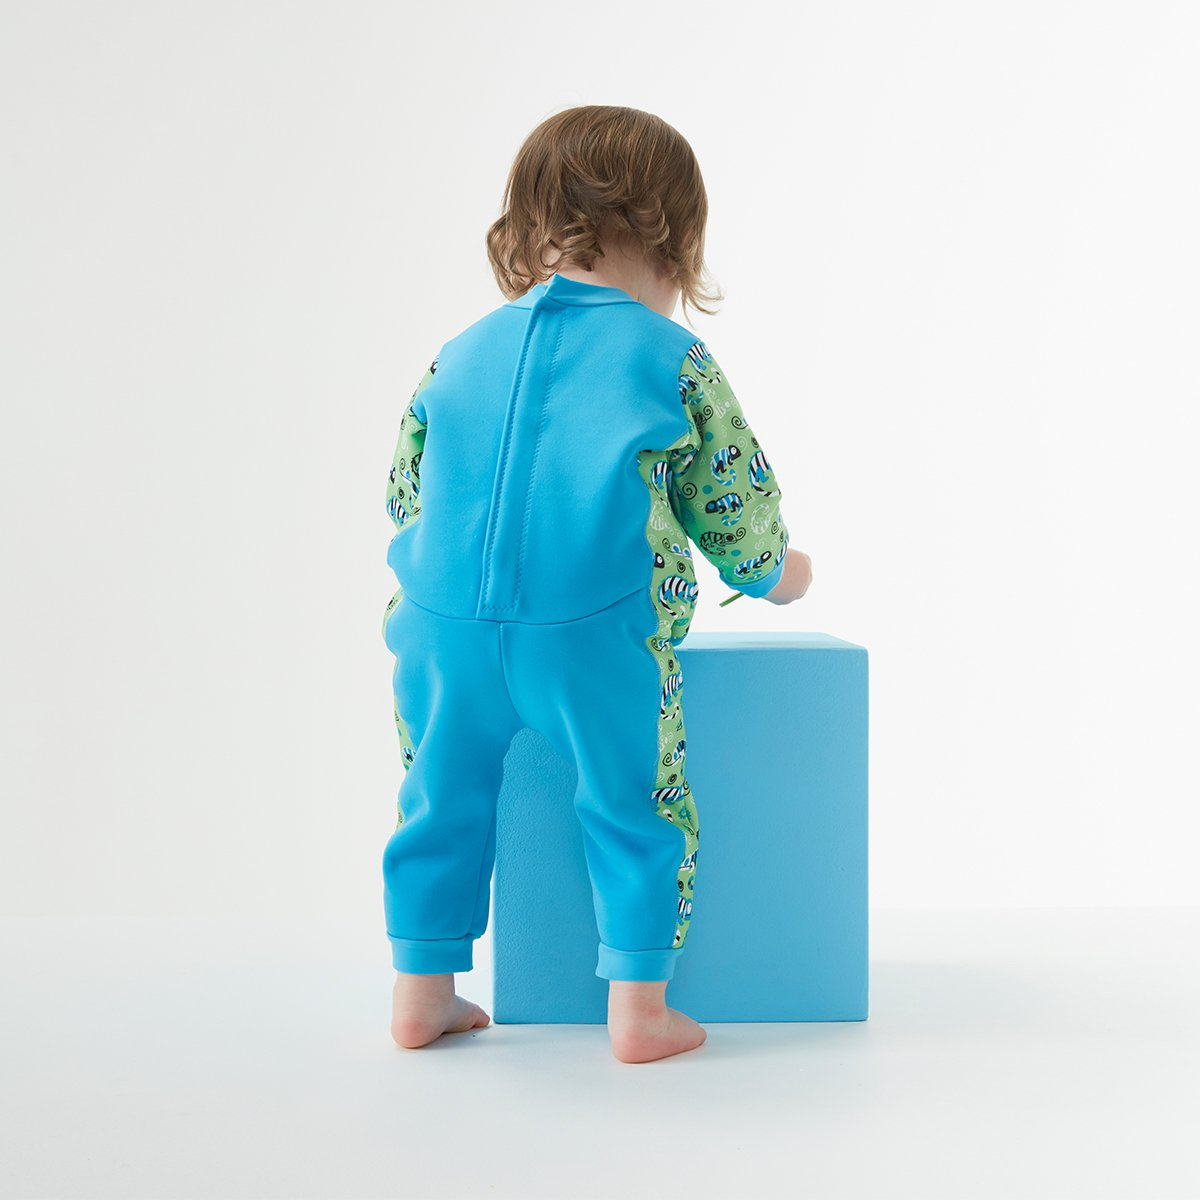 Splash About Warm in One Maillot de Bain Enfant